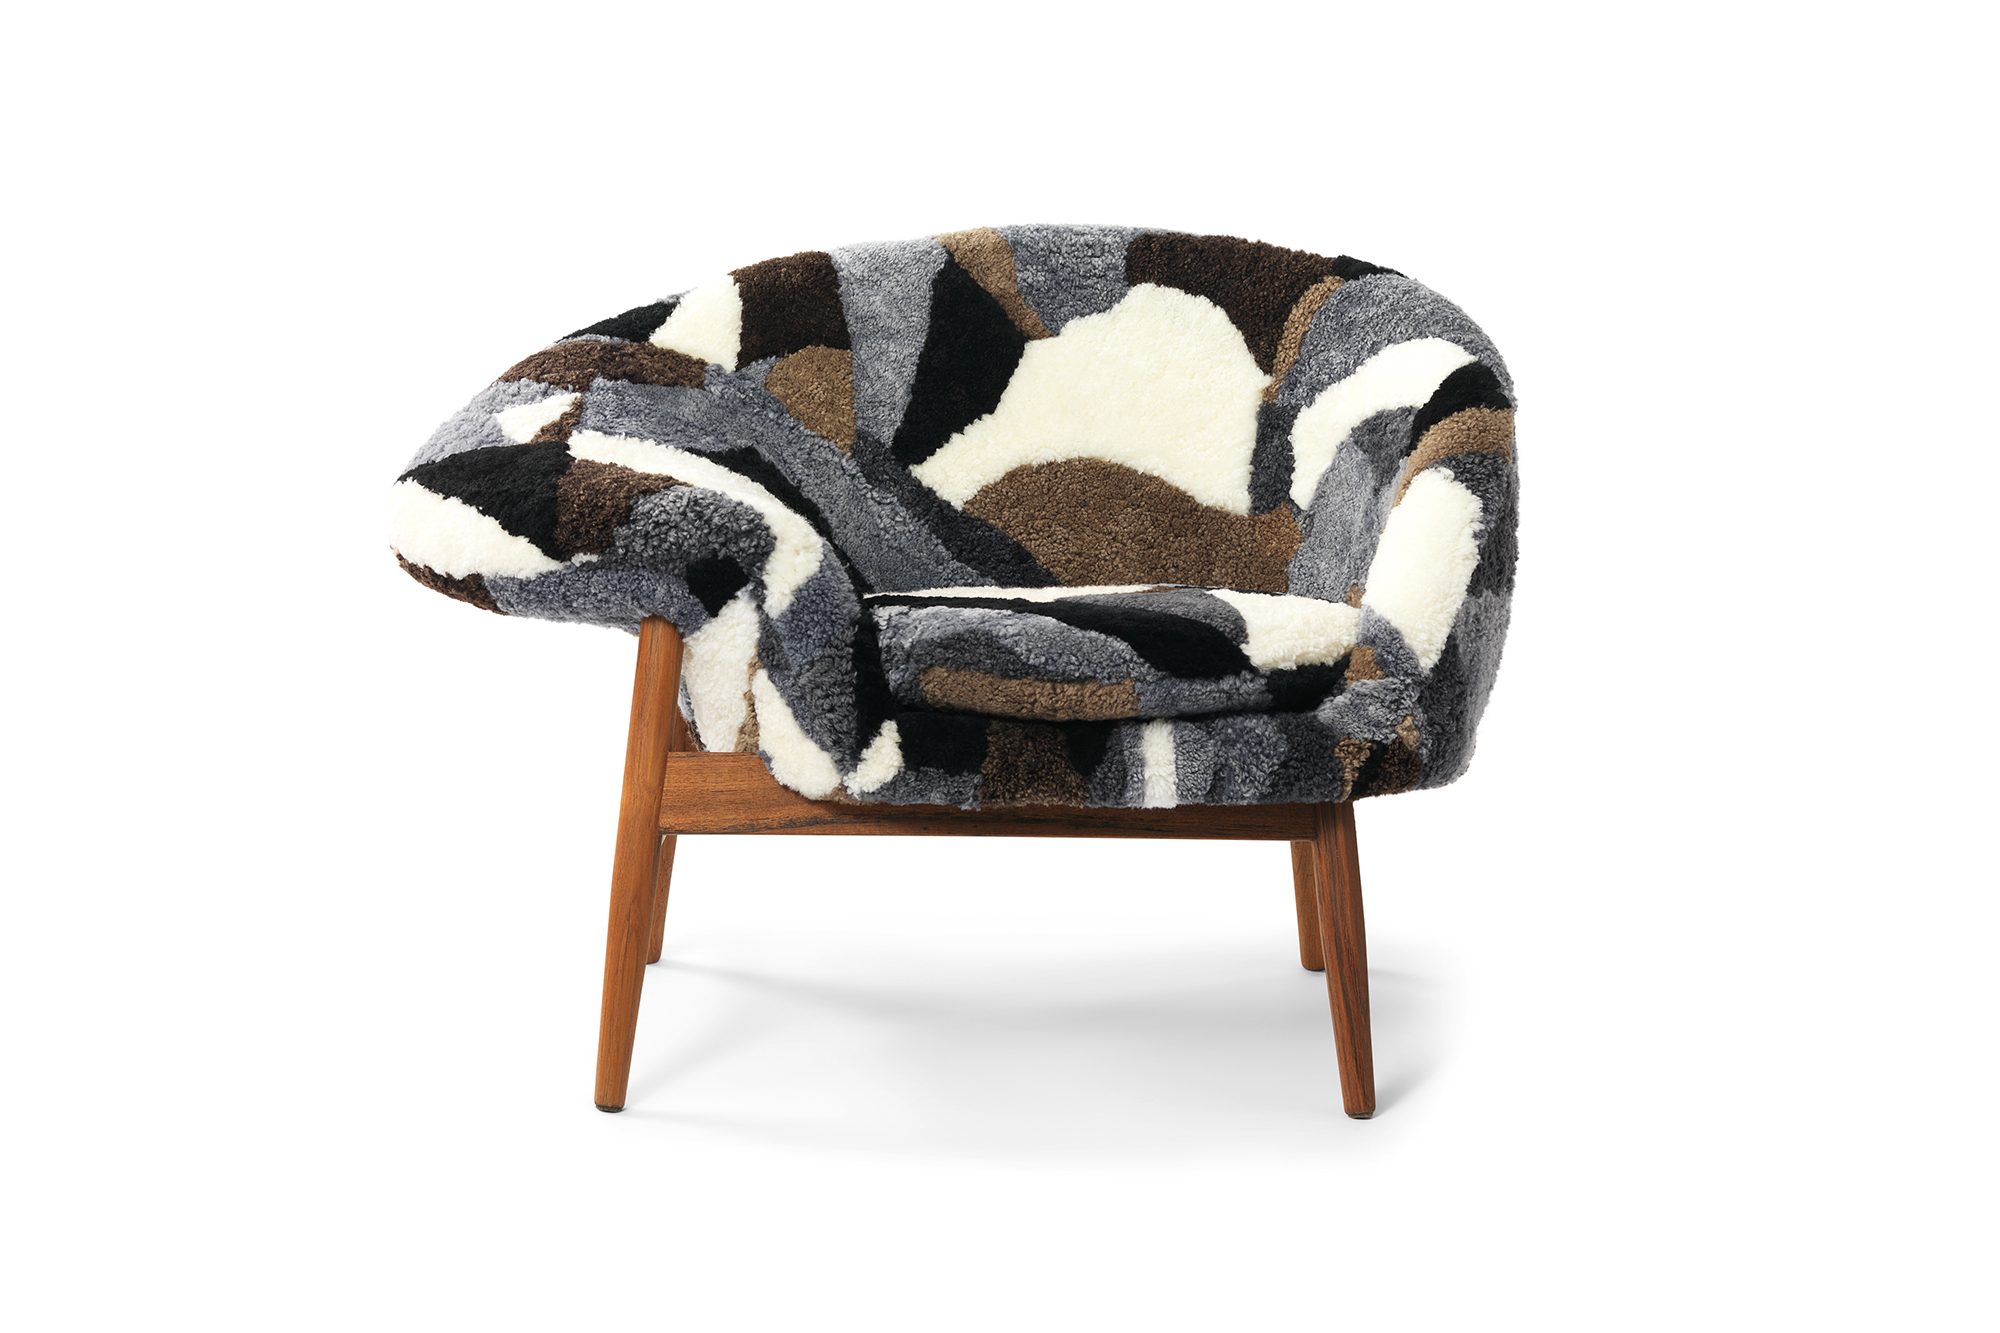 Fried Egg Sheep Chair